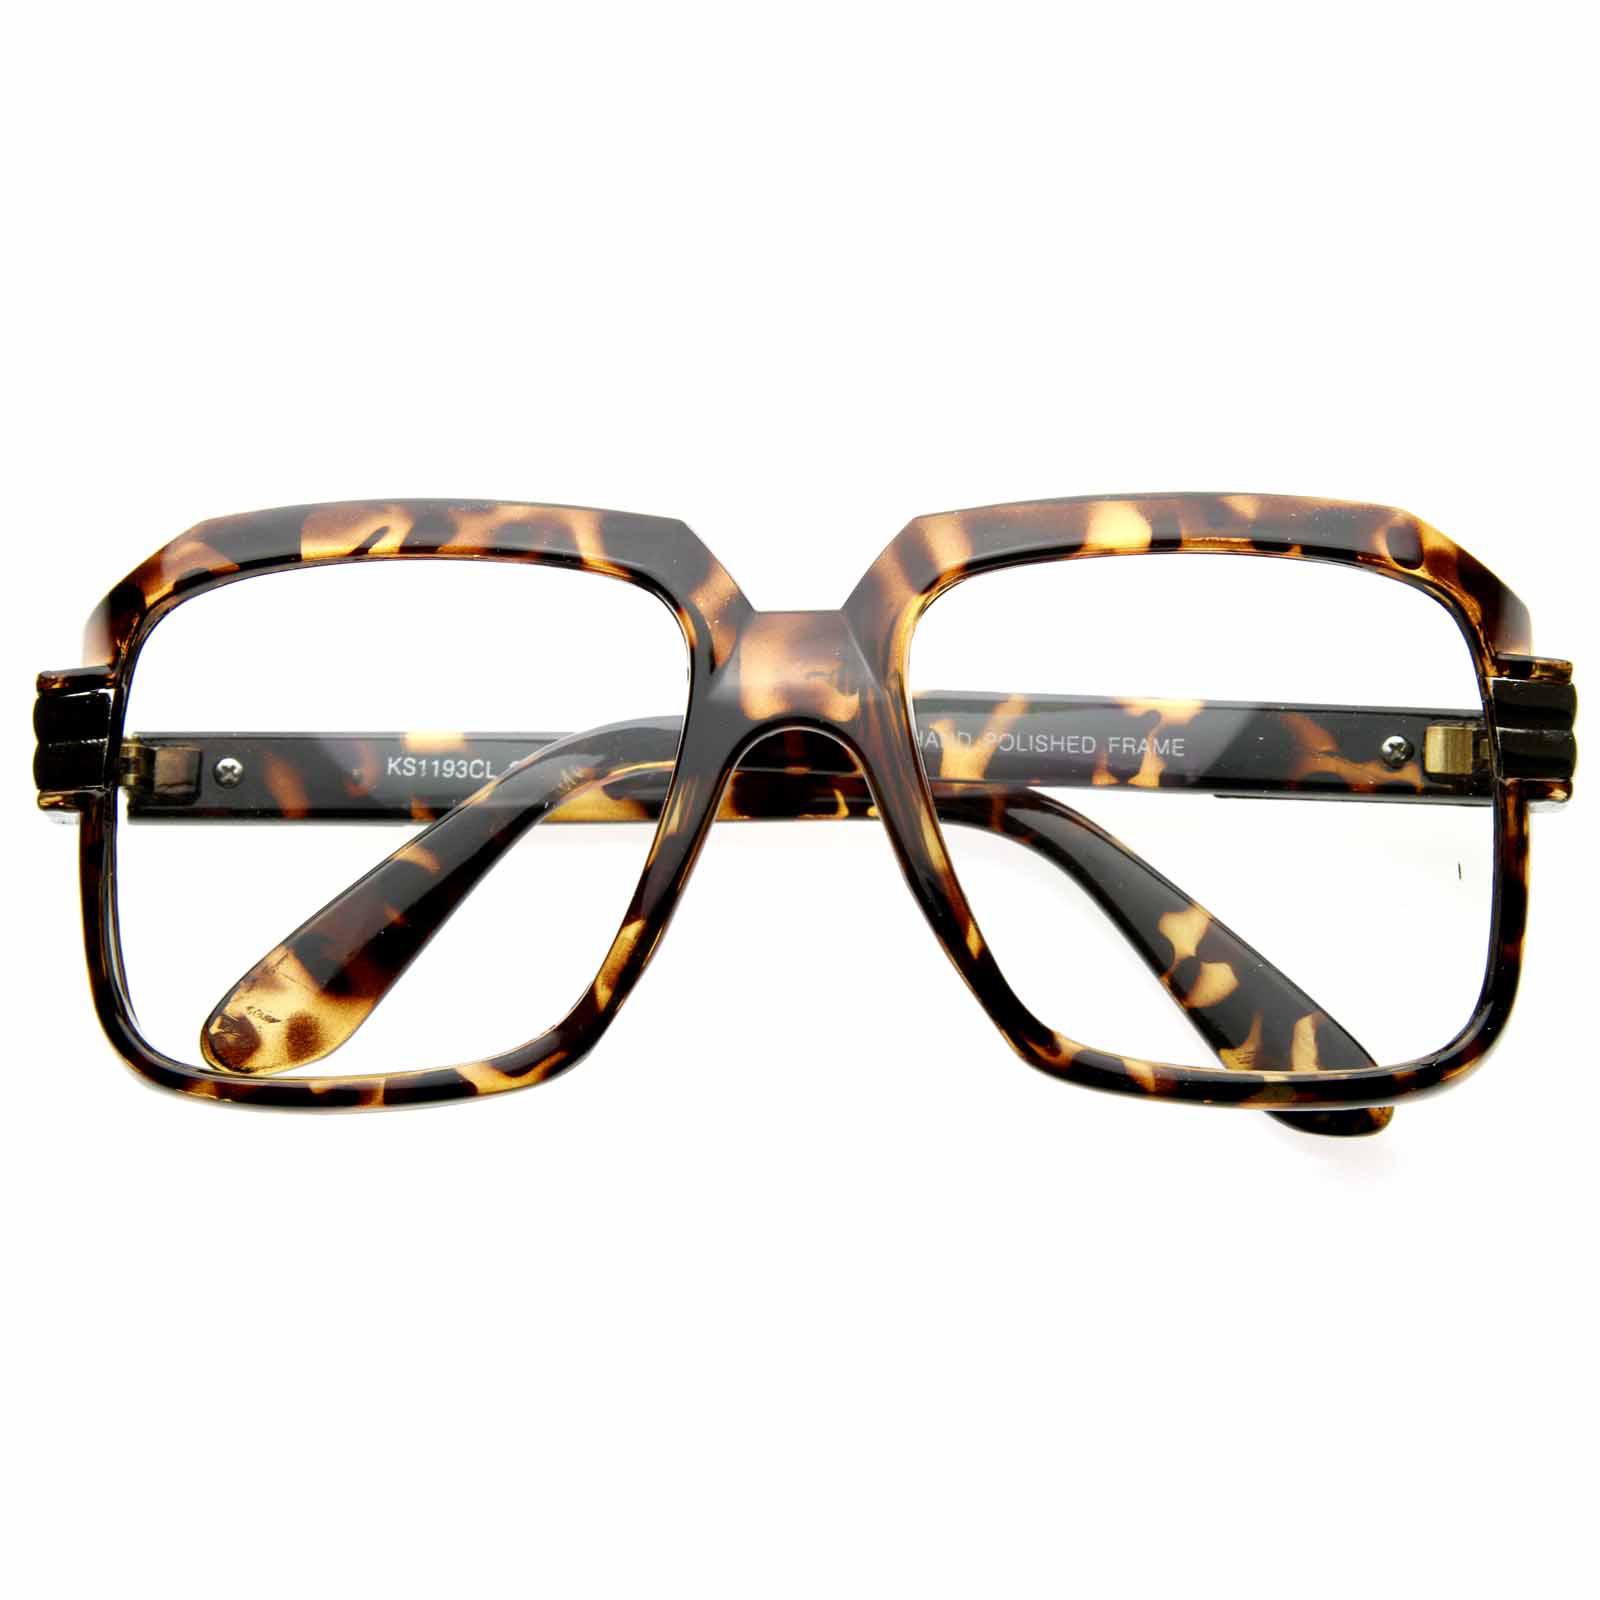 5aca209cb16 Old School Hip Hop Run DMC Style Square Vintage Squared Eyeglasses ...